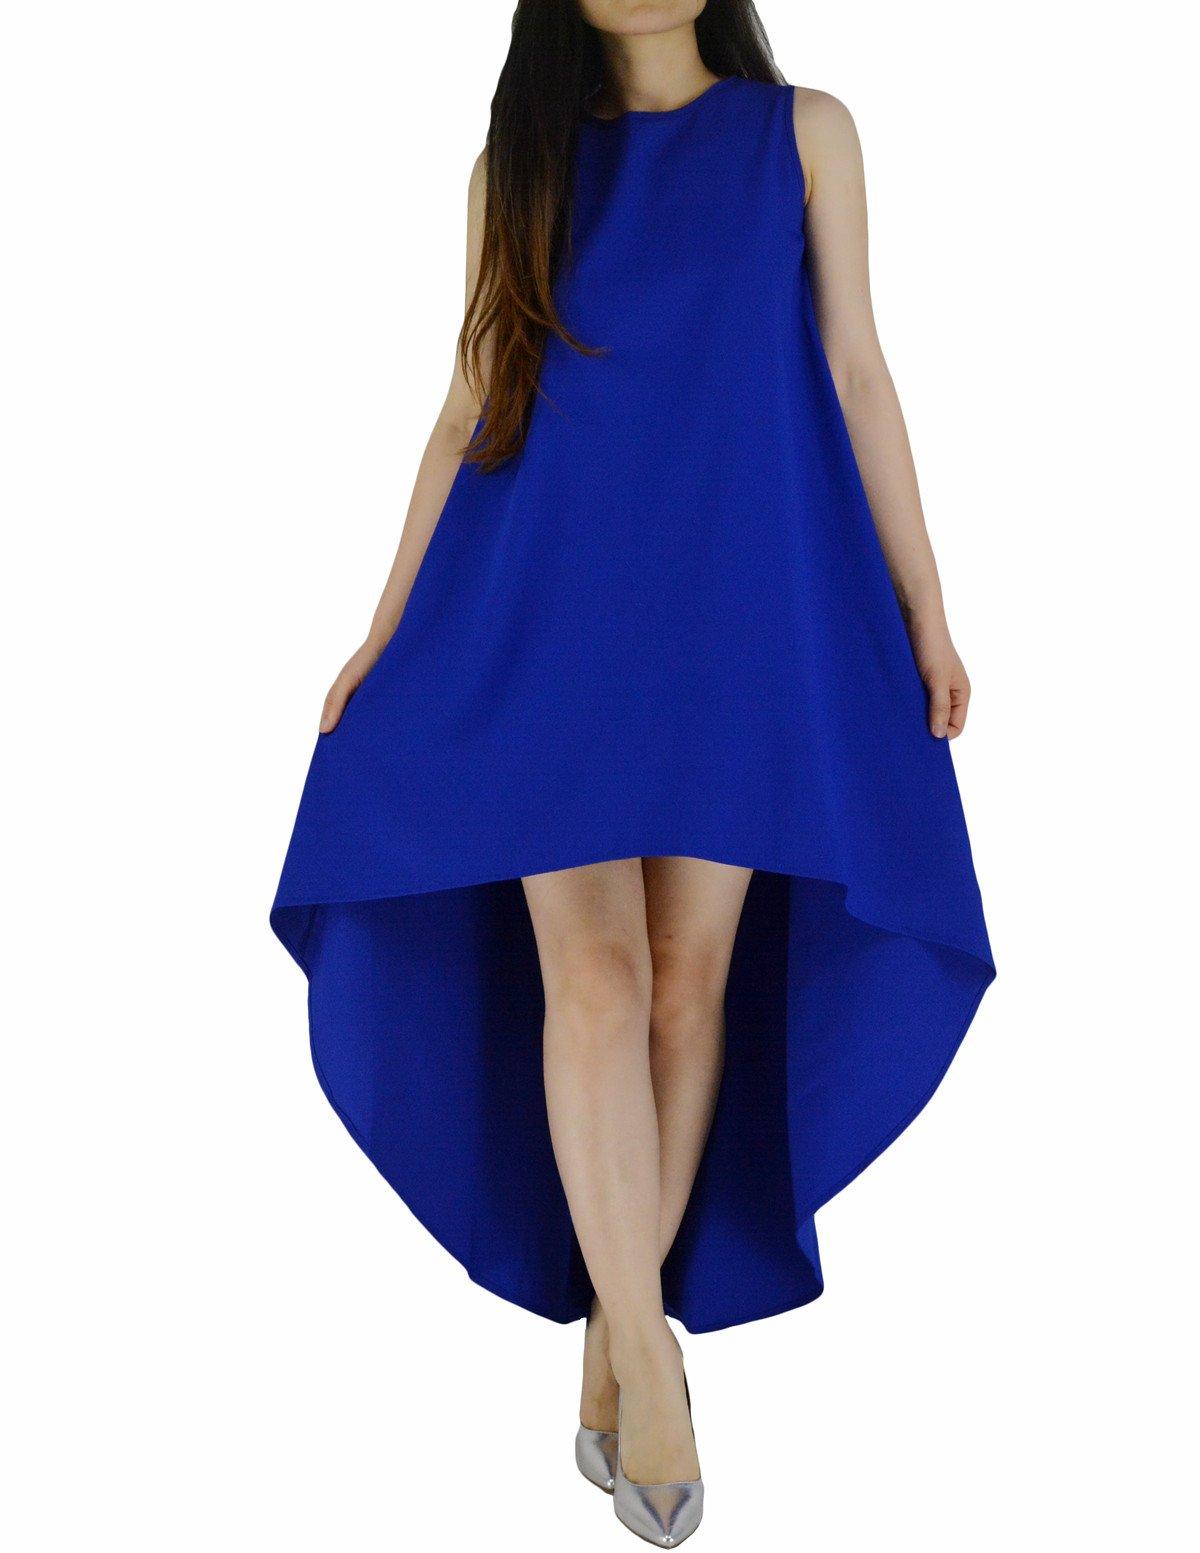 YSJERA Women's Chiffon Solid Sleeveless High Low Maxi Dress Evening Party Dresses (18,Blue)